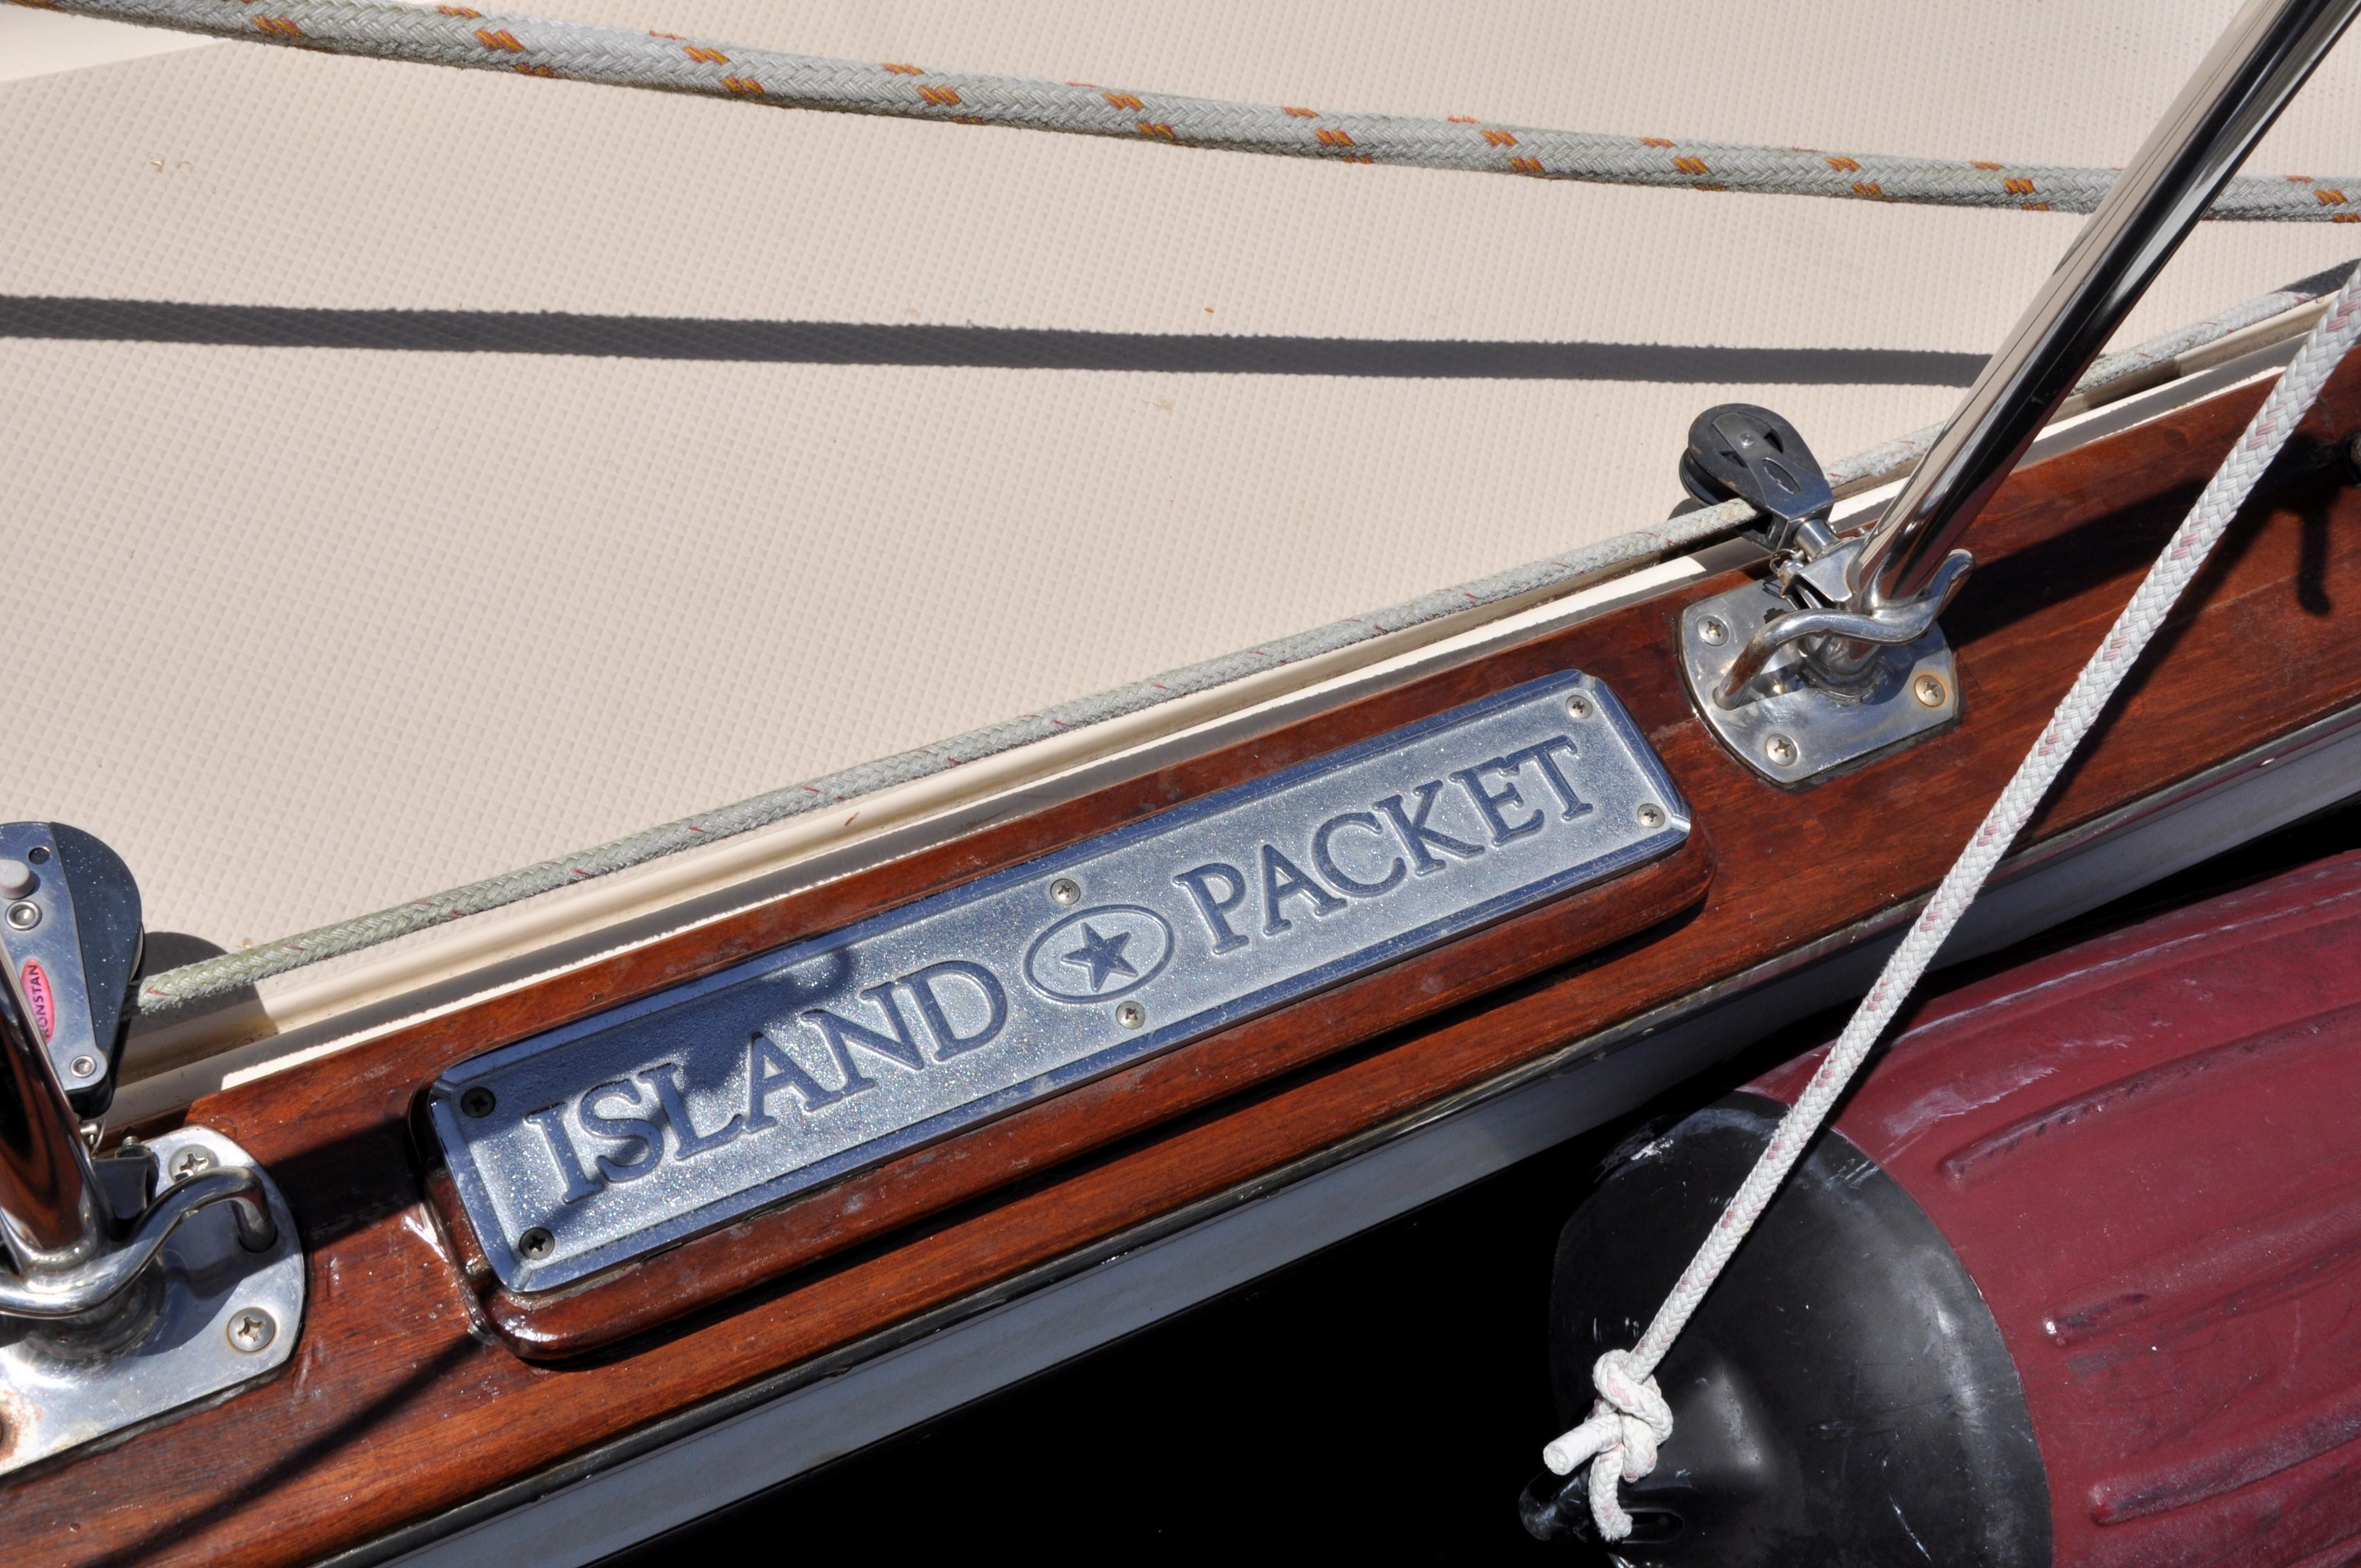 ISLAND PACKET STEP PLATES